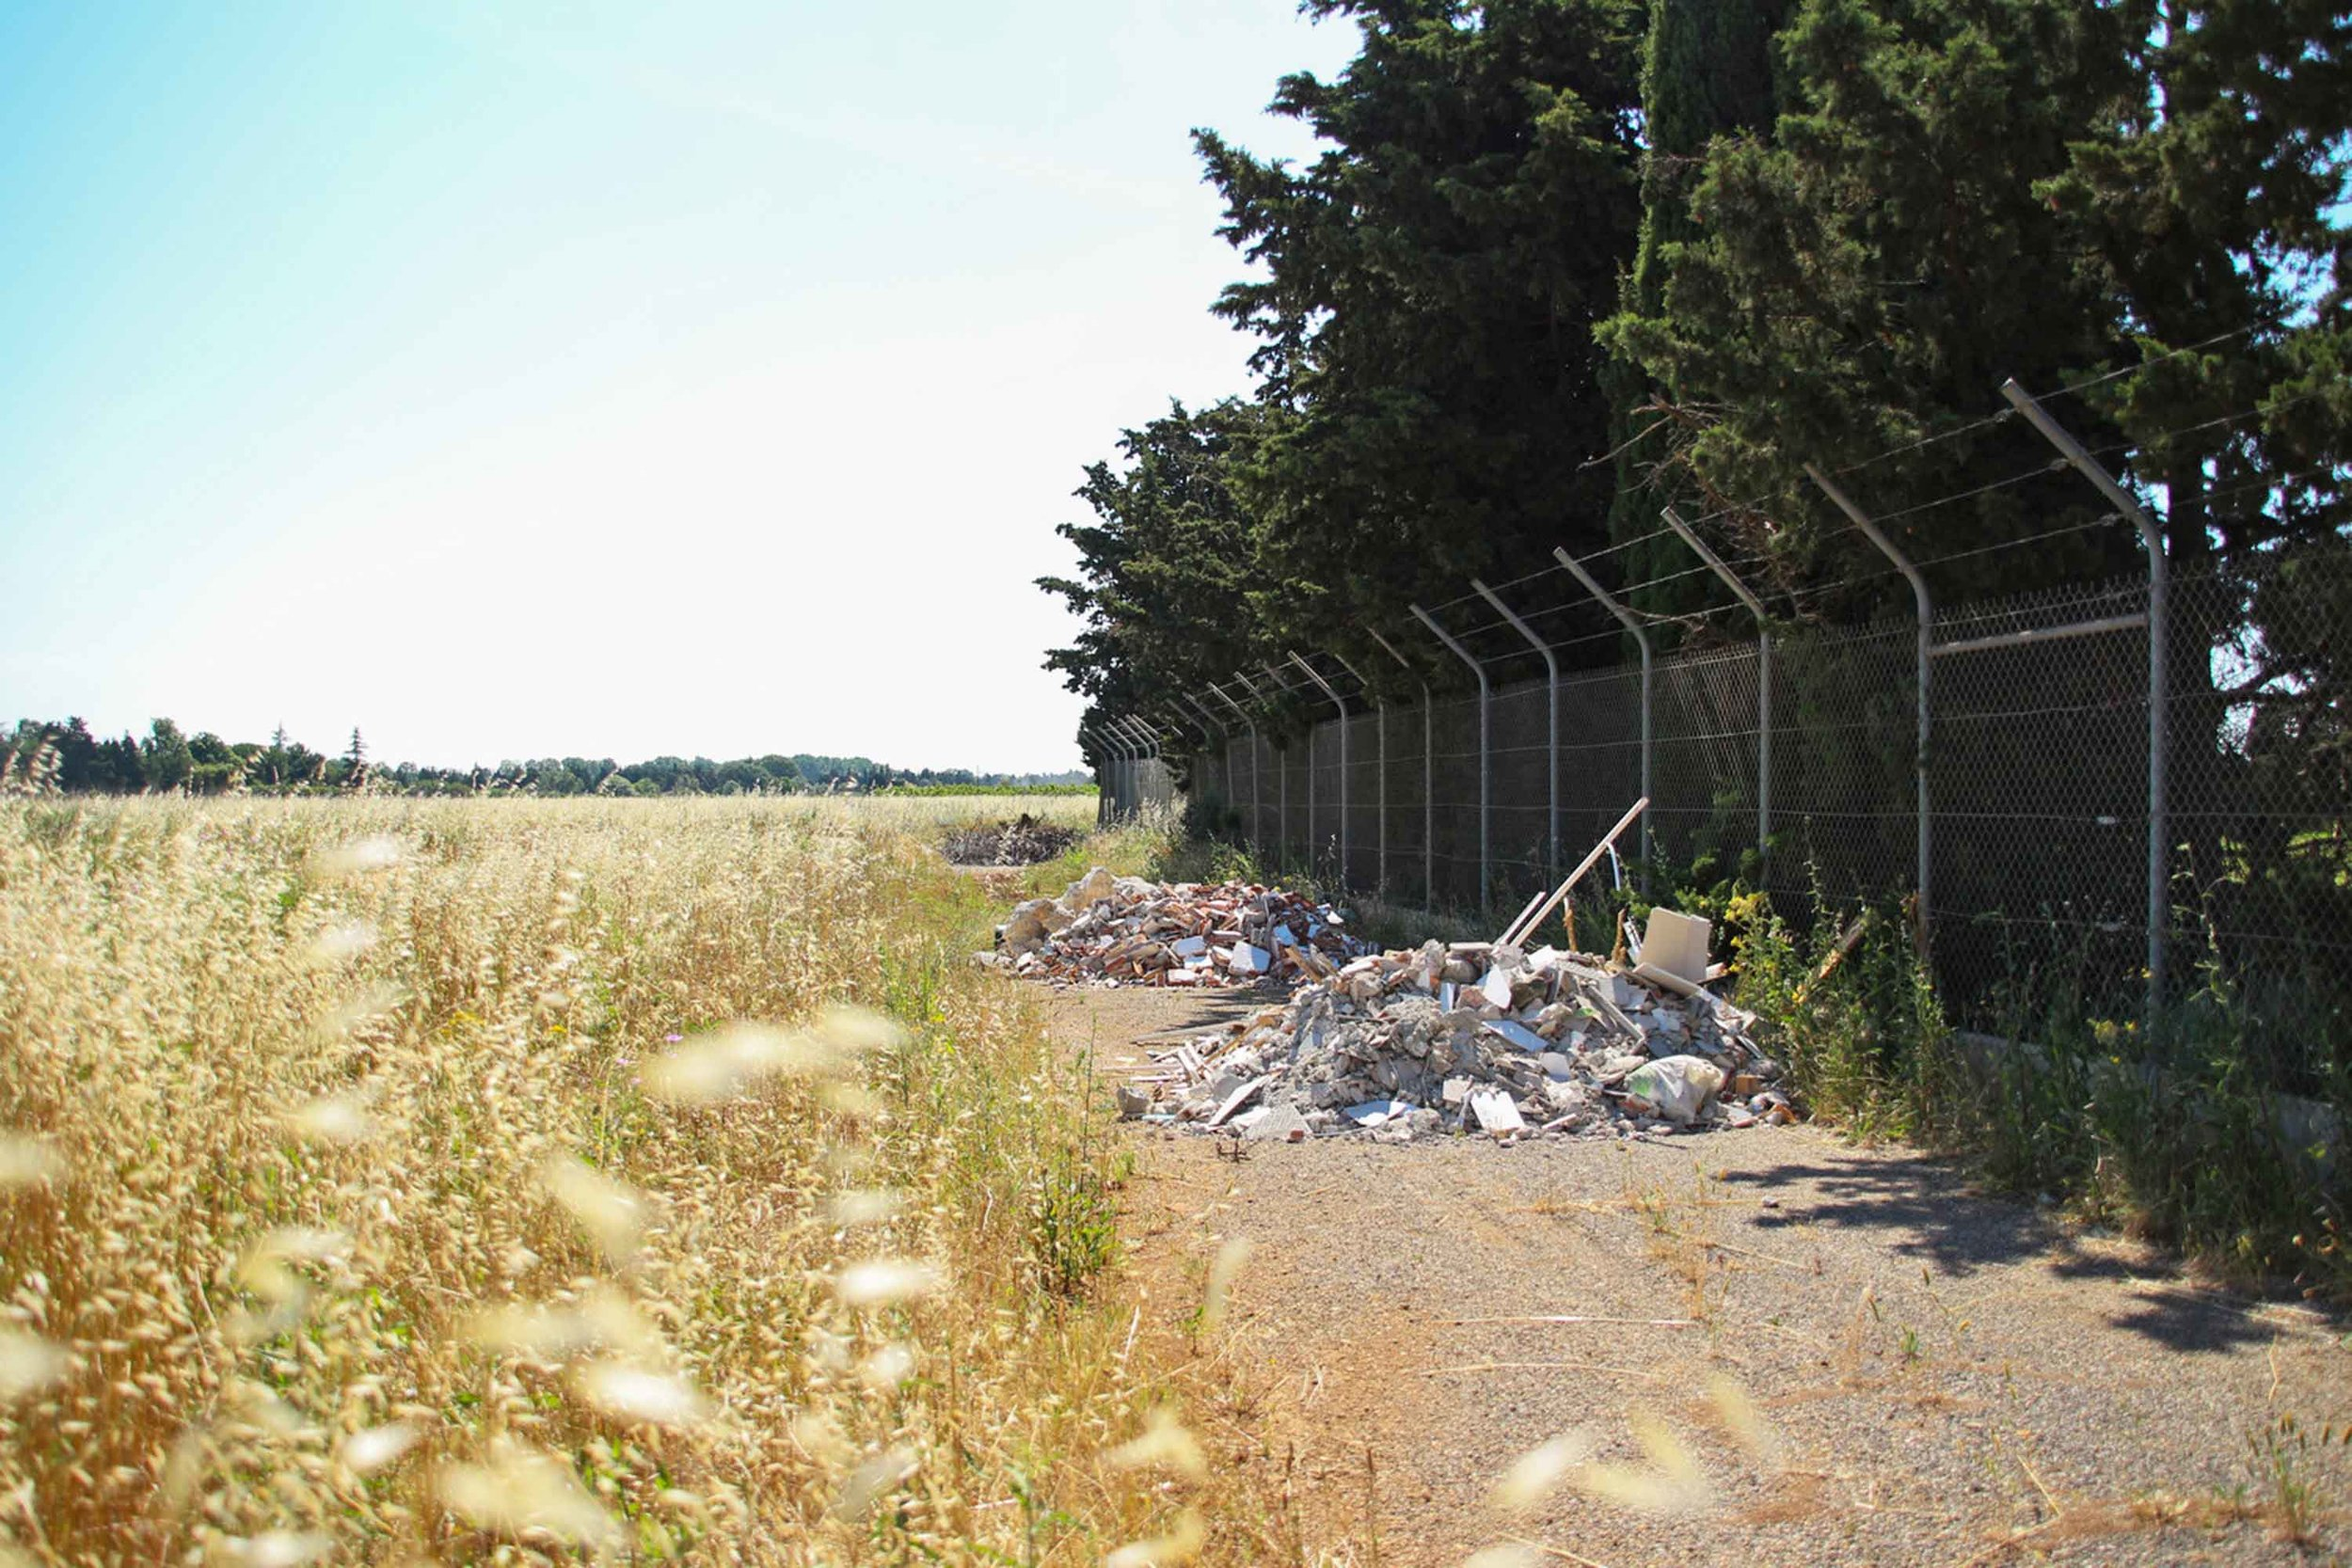 Migropoli_City Gate_Garbage-02.jpg